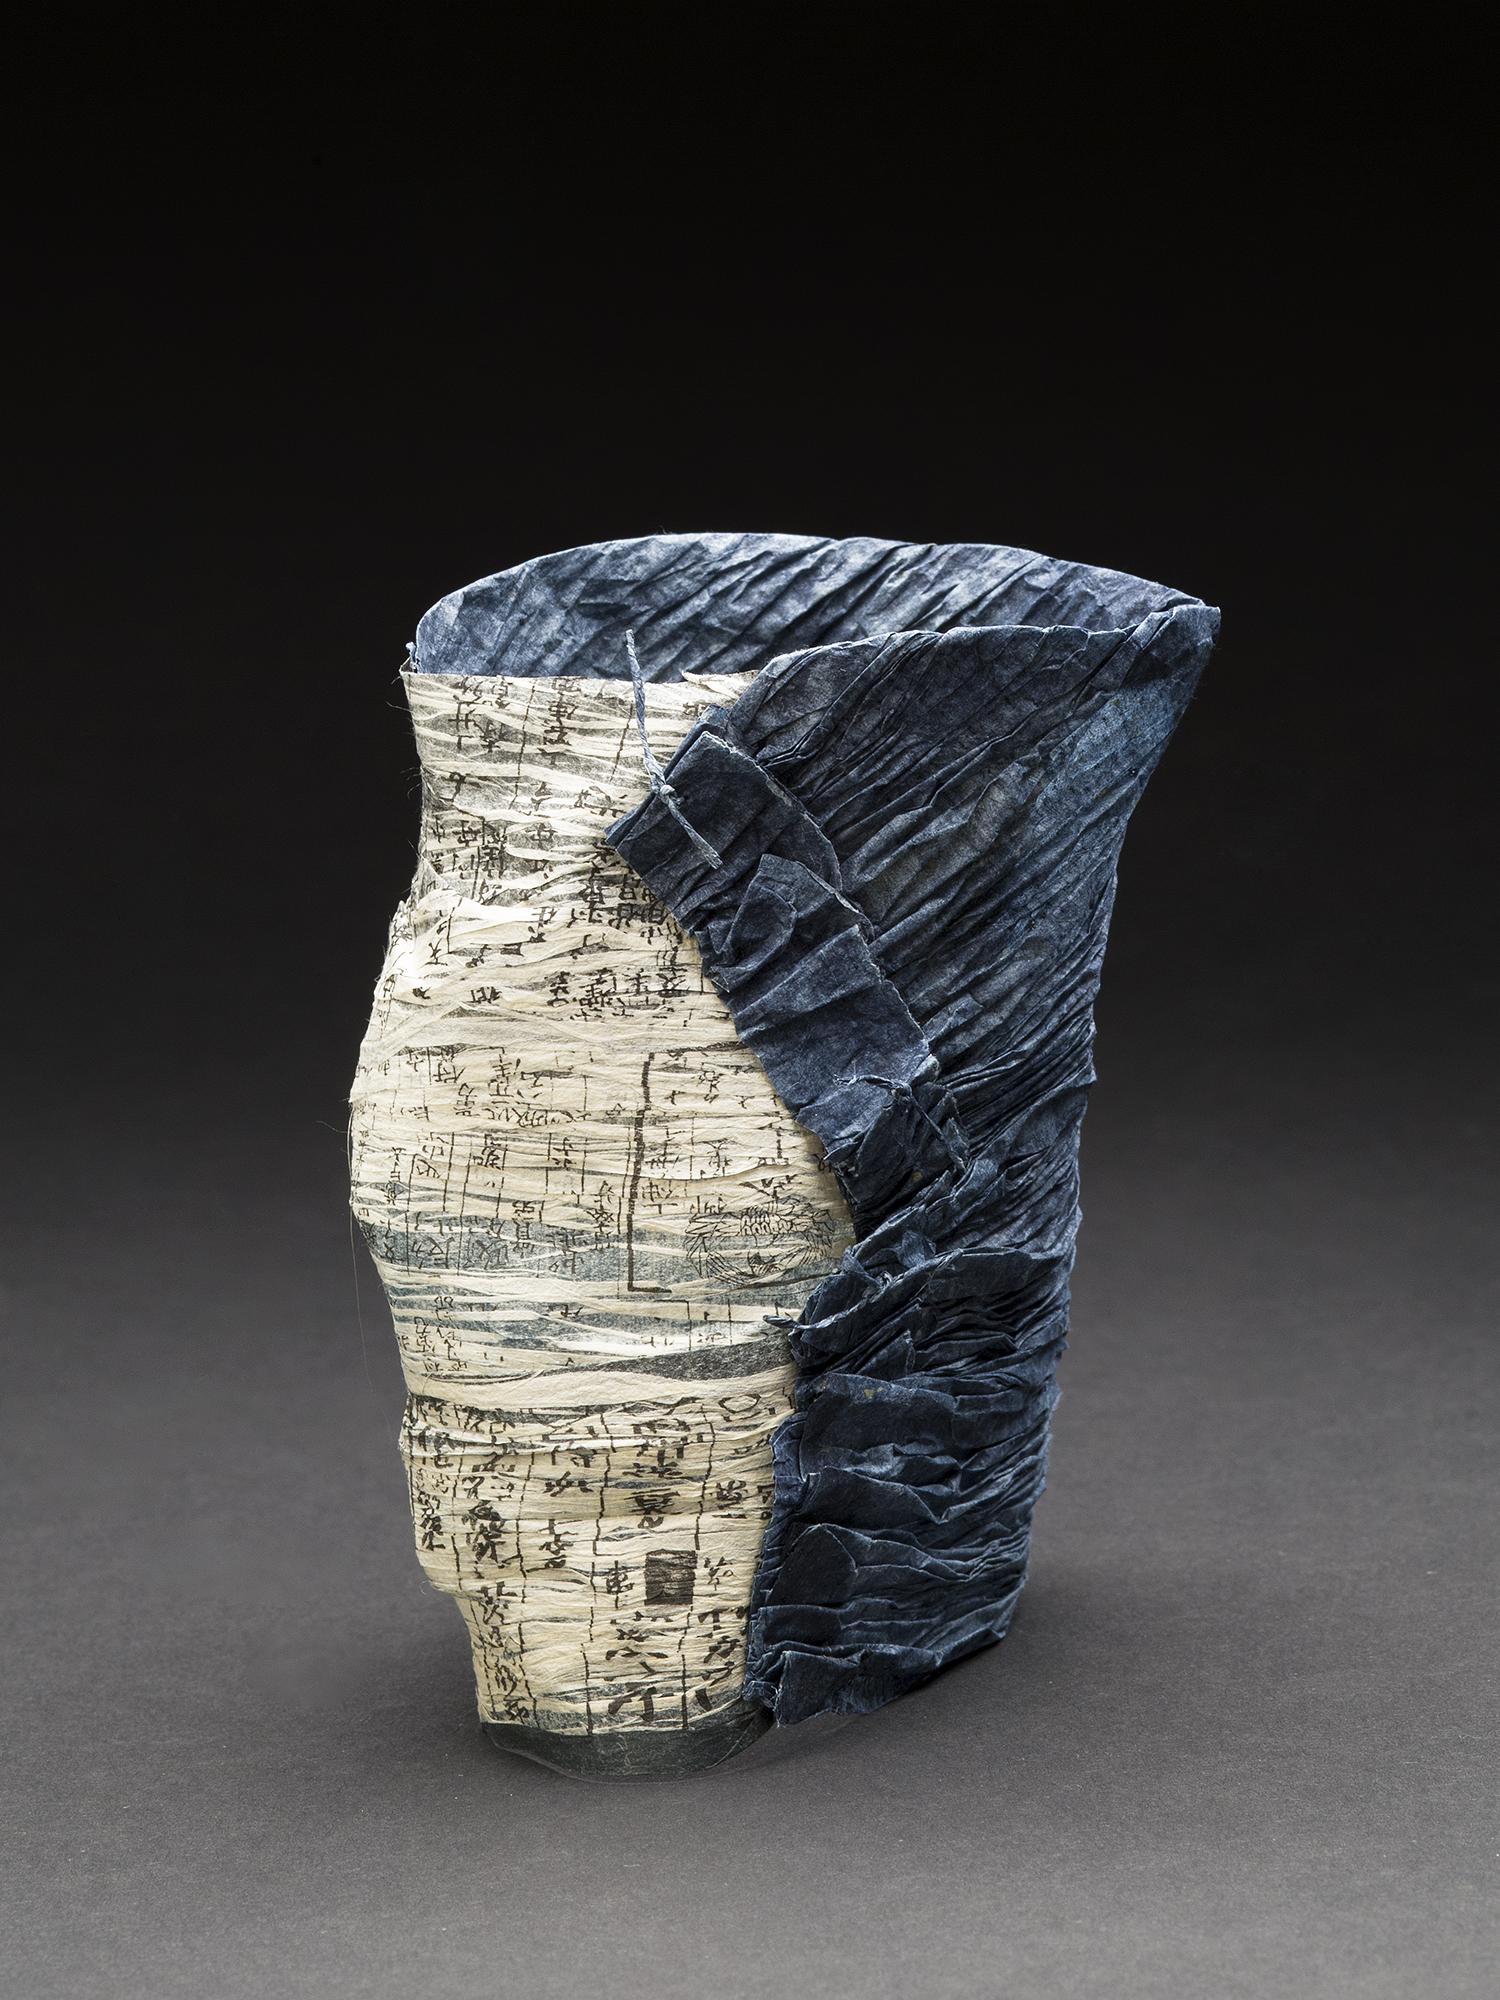 Yuko Kimura    Indigo Shiwa Shiwa No. 8  , 2014 Aquatint, indigo dye on old bookpages and kozo handmade paper, paper thread, Konnyaku ( devil's tongue root starch) 4.5 x 3.25 x 3.25 inches 11.4 x 8.3 x 8.3 cm YuK 30